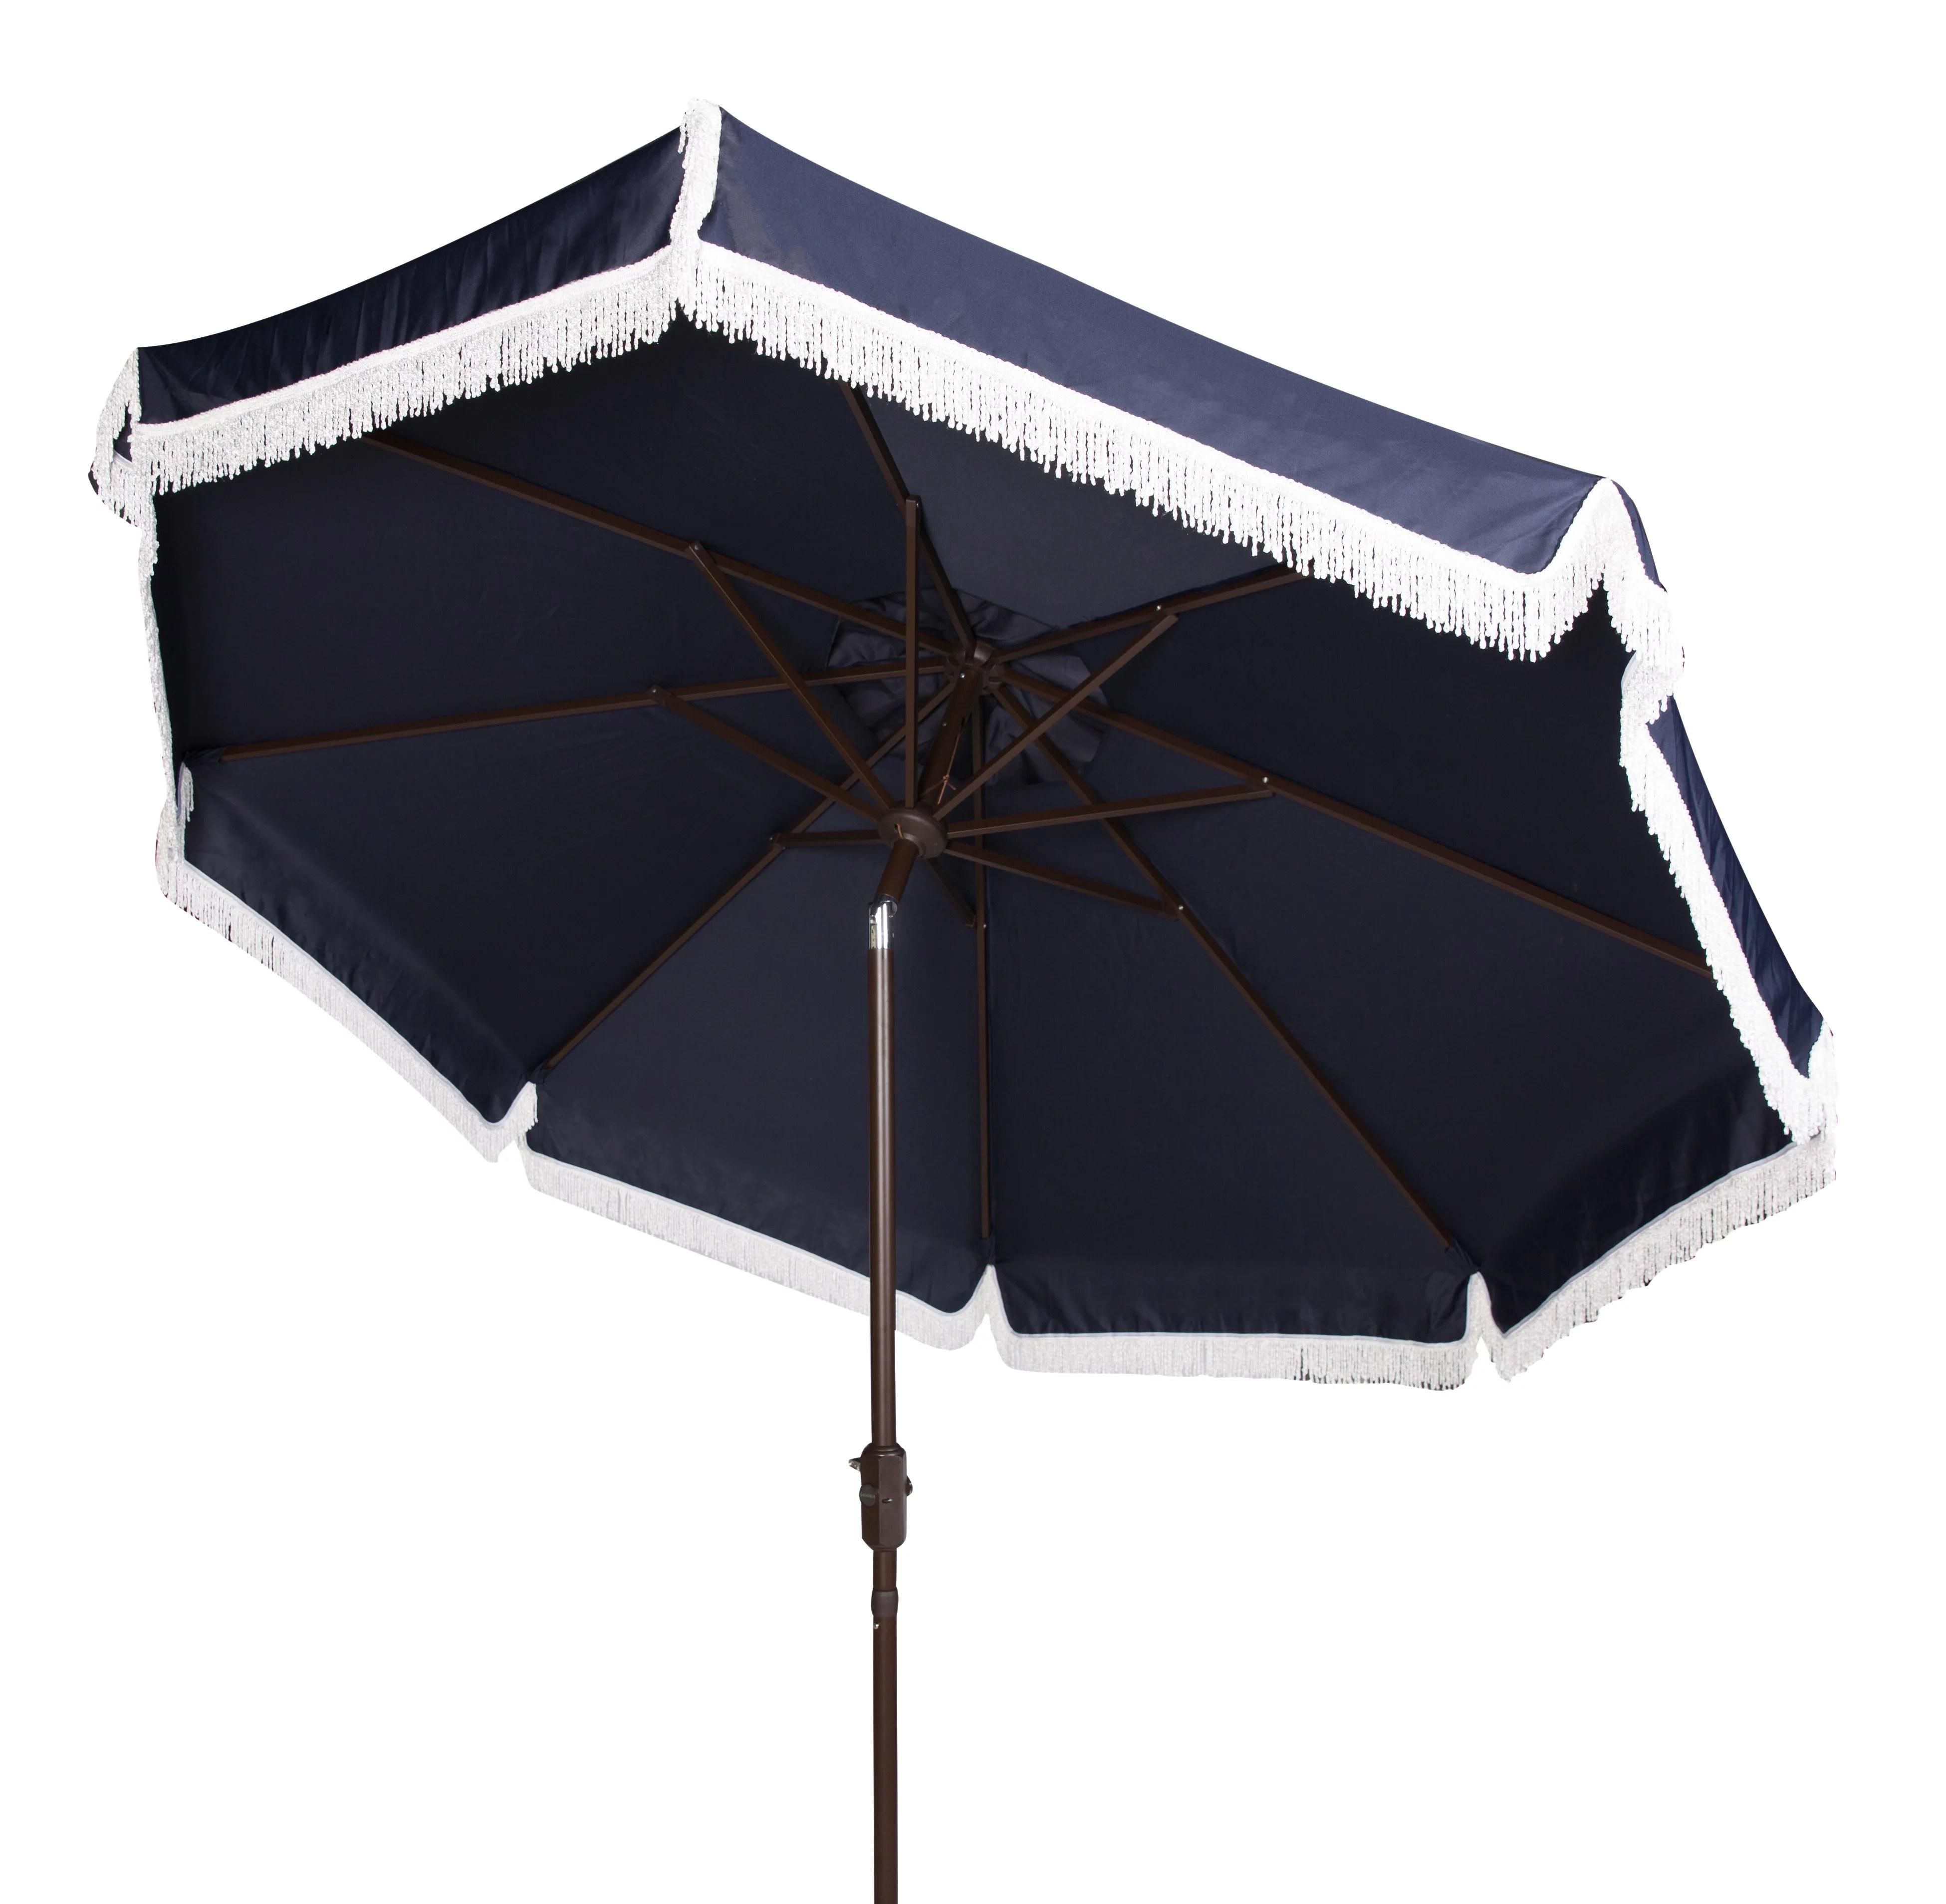 safavieh milan 9 market crank fringe tilt patio umbrella navy white walmart com